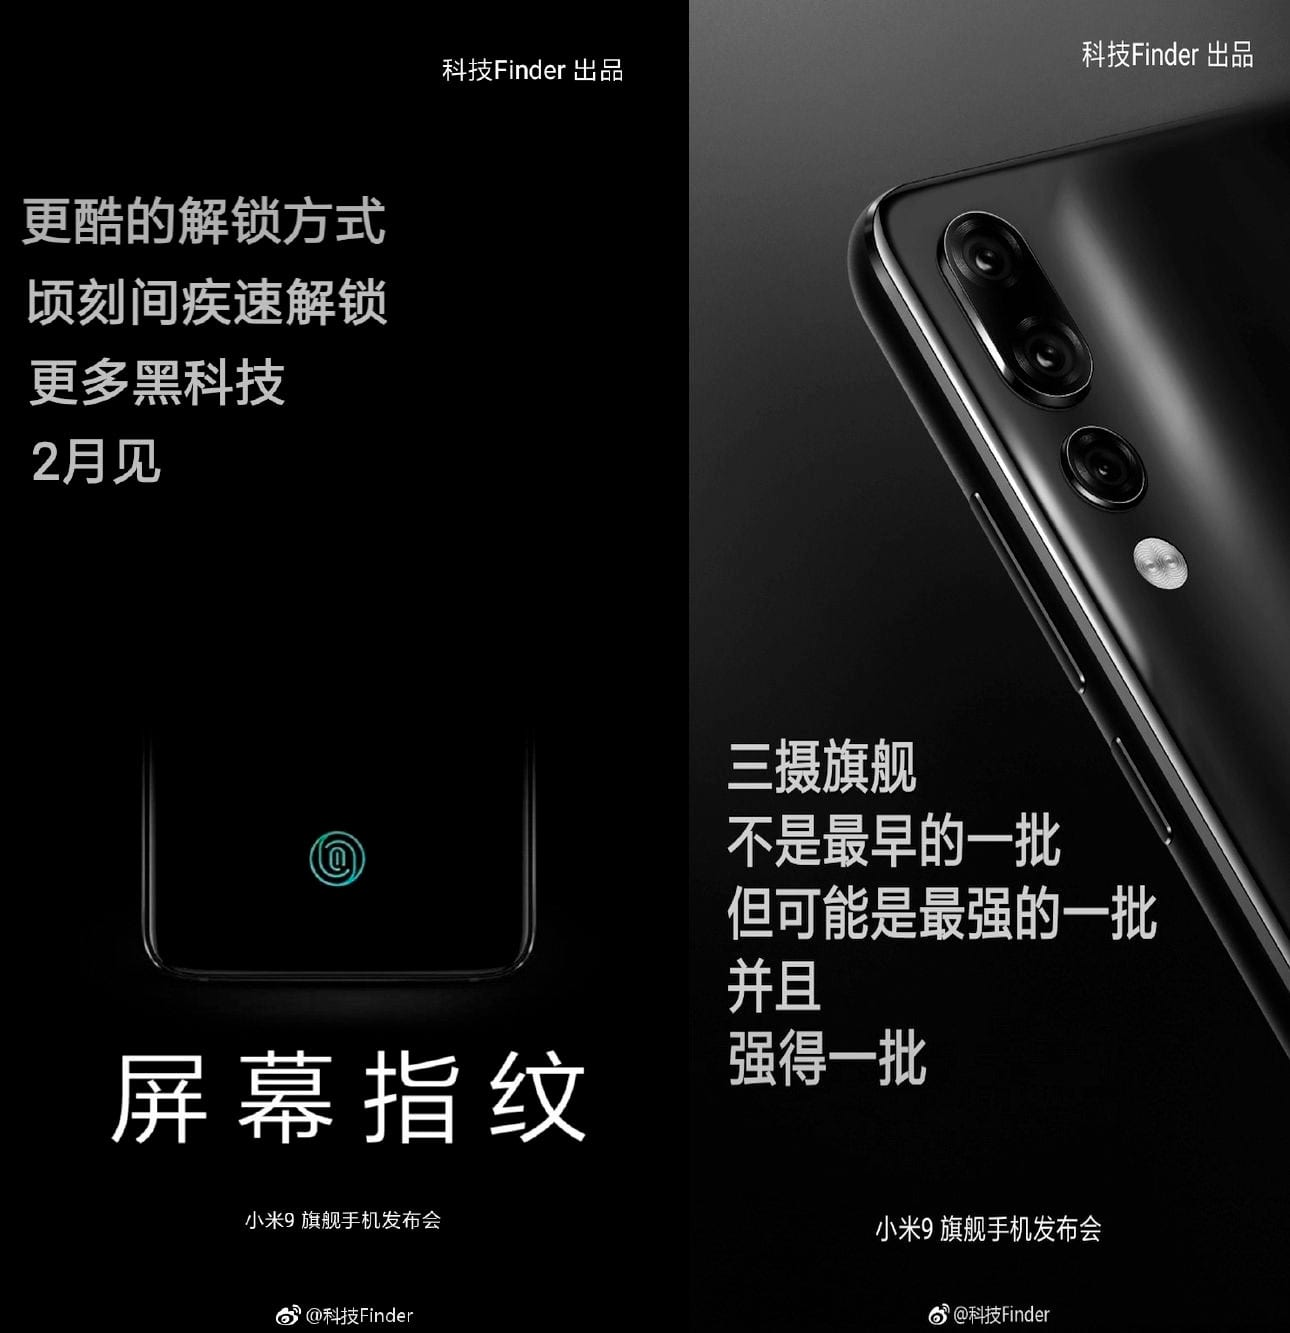 triple camera, fingerprint sensor on screen and ms